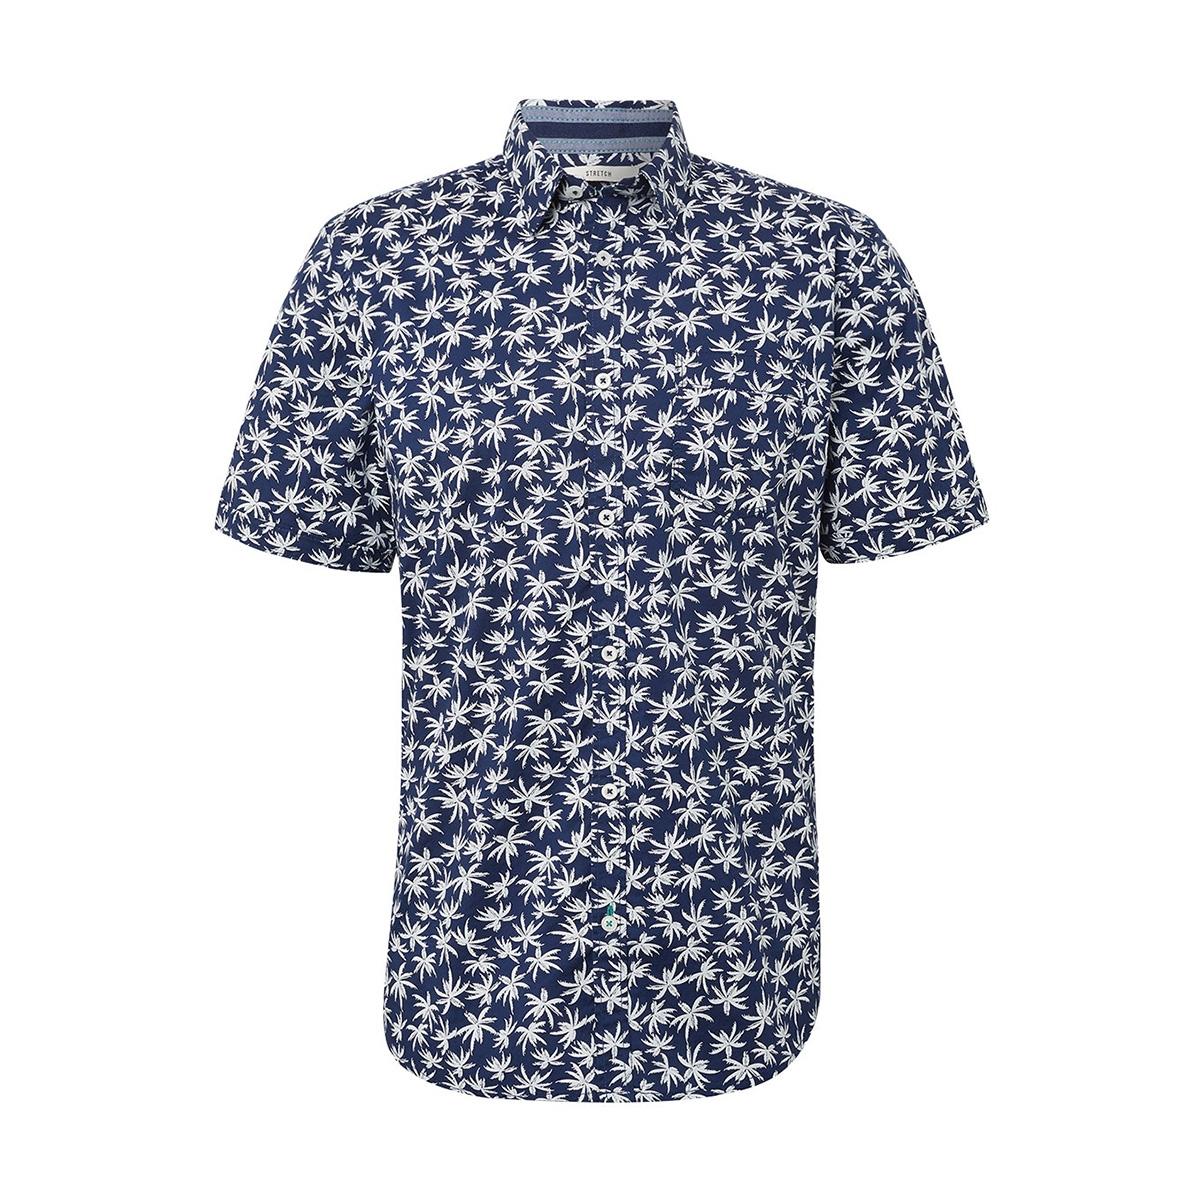 overhemd met patroon 1010870xx10 tom tailor overhemd 17657